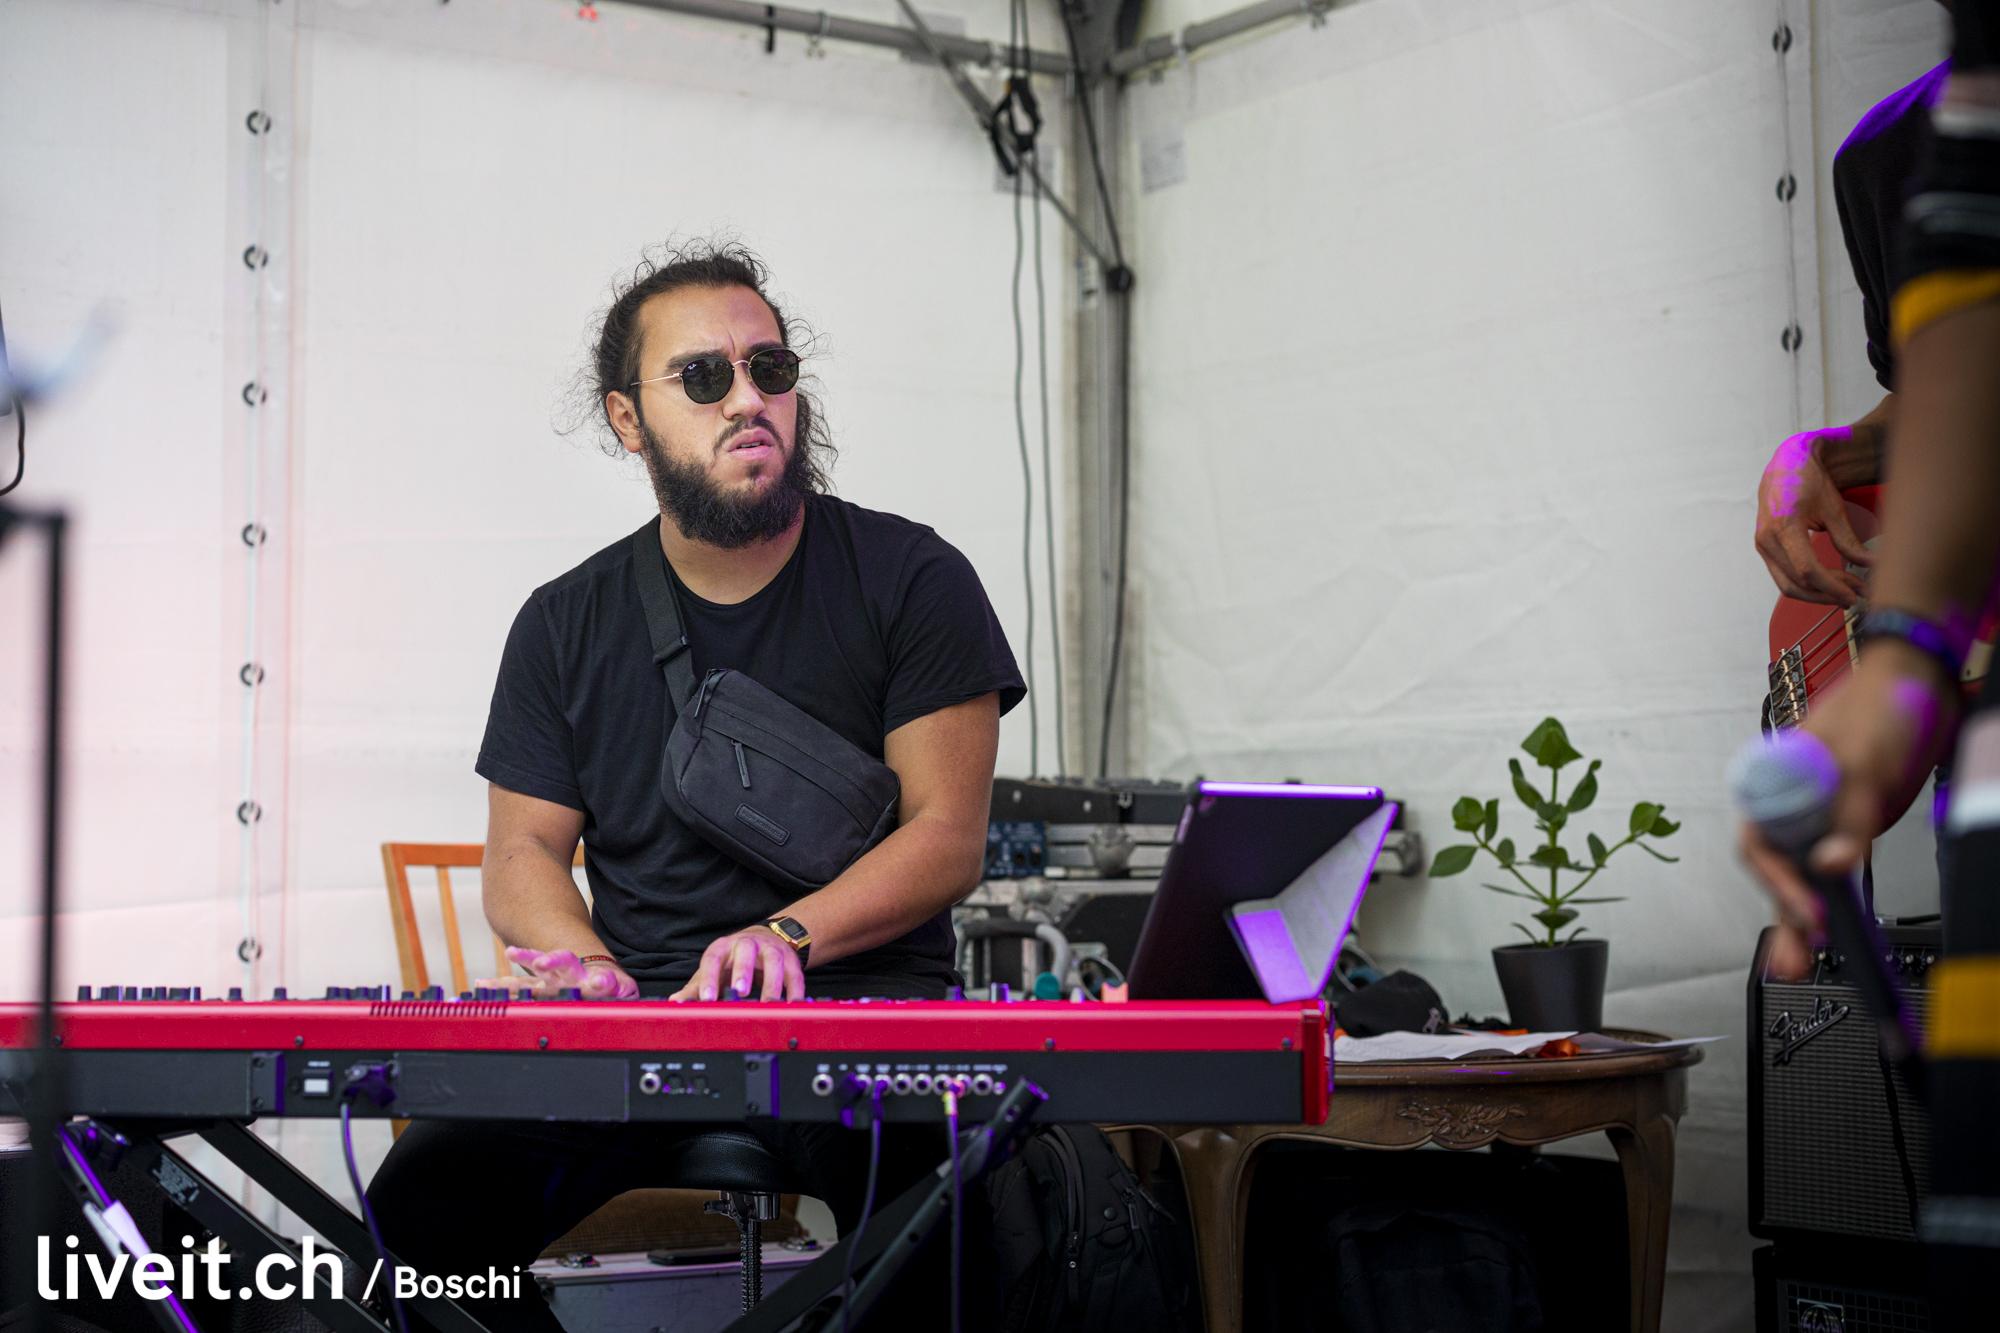 Bienna Session Collective am Thunfest 2019 (liveit.ch/boschi)